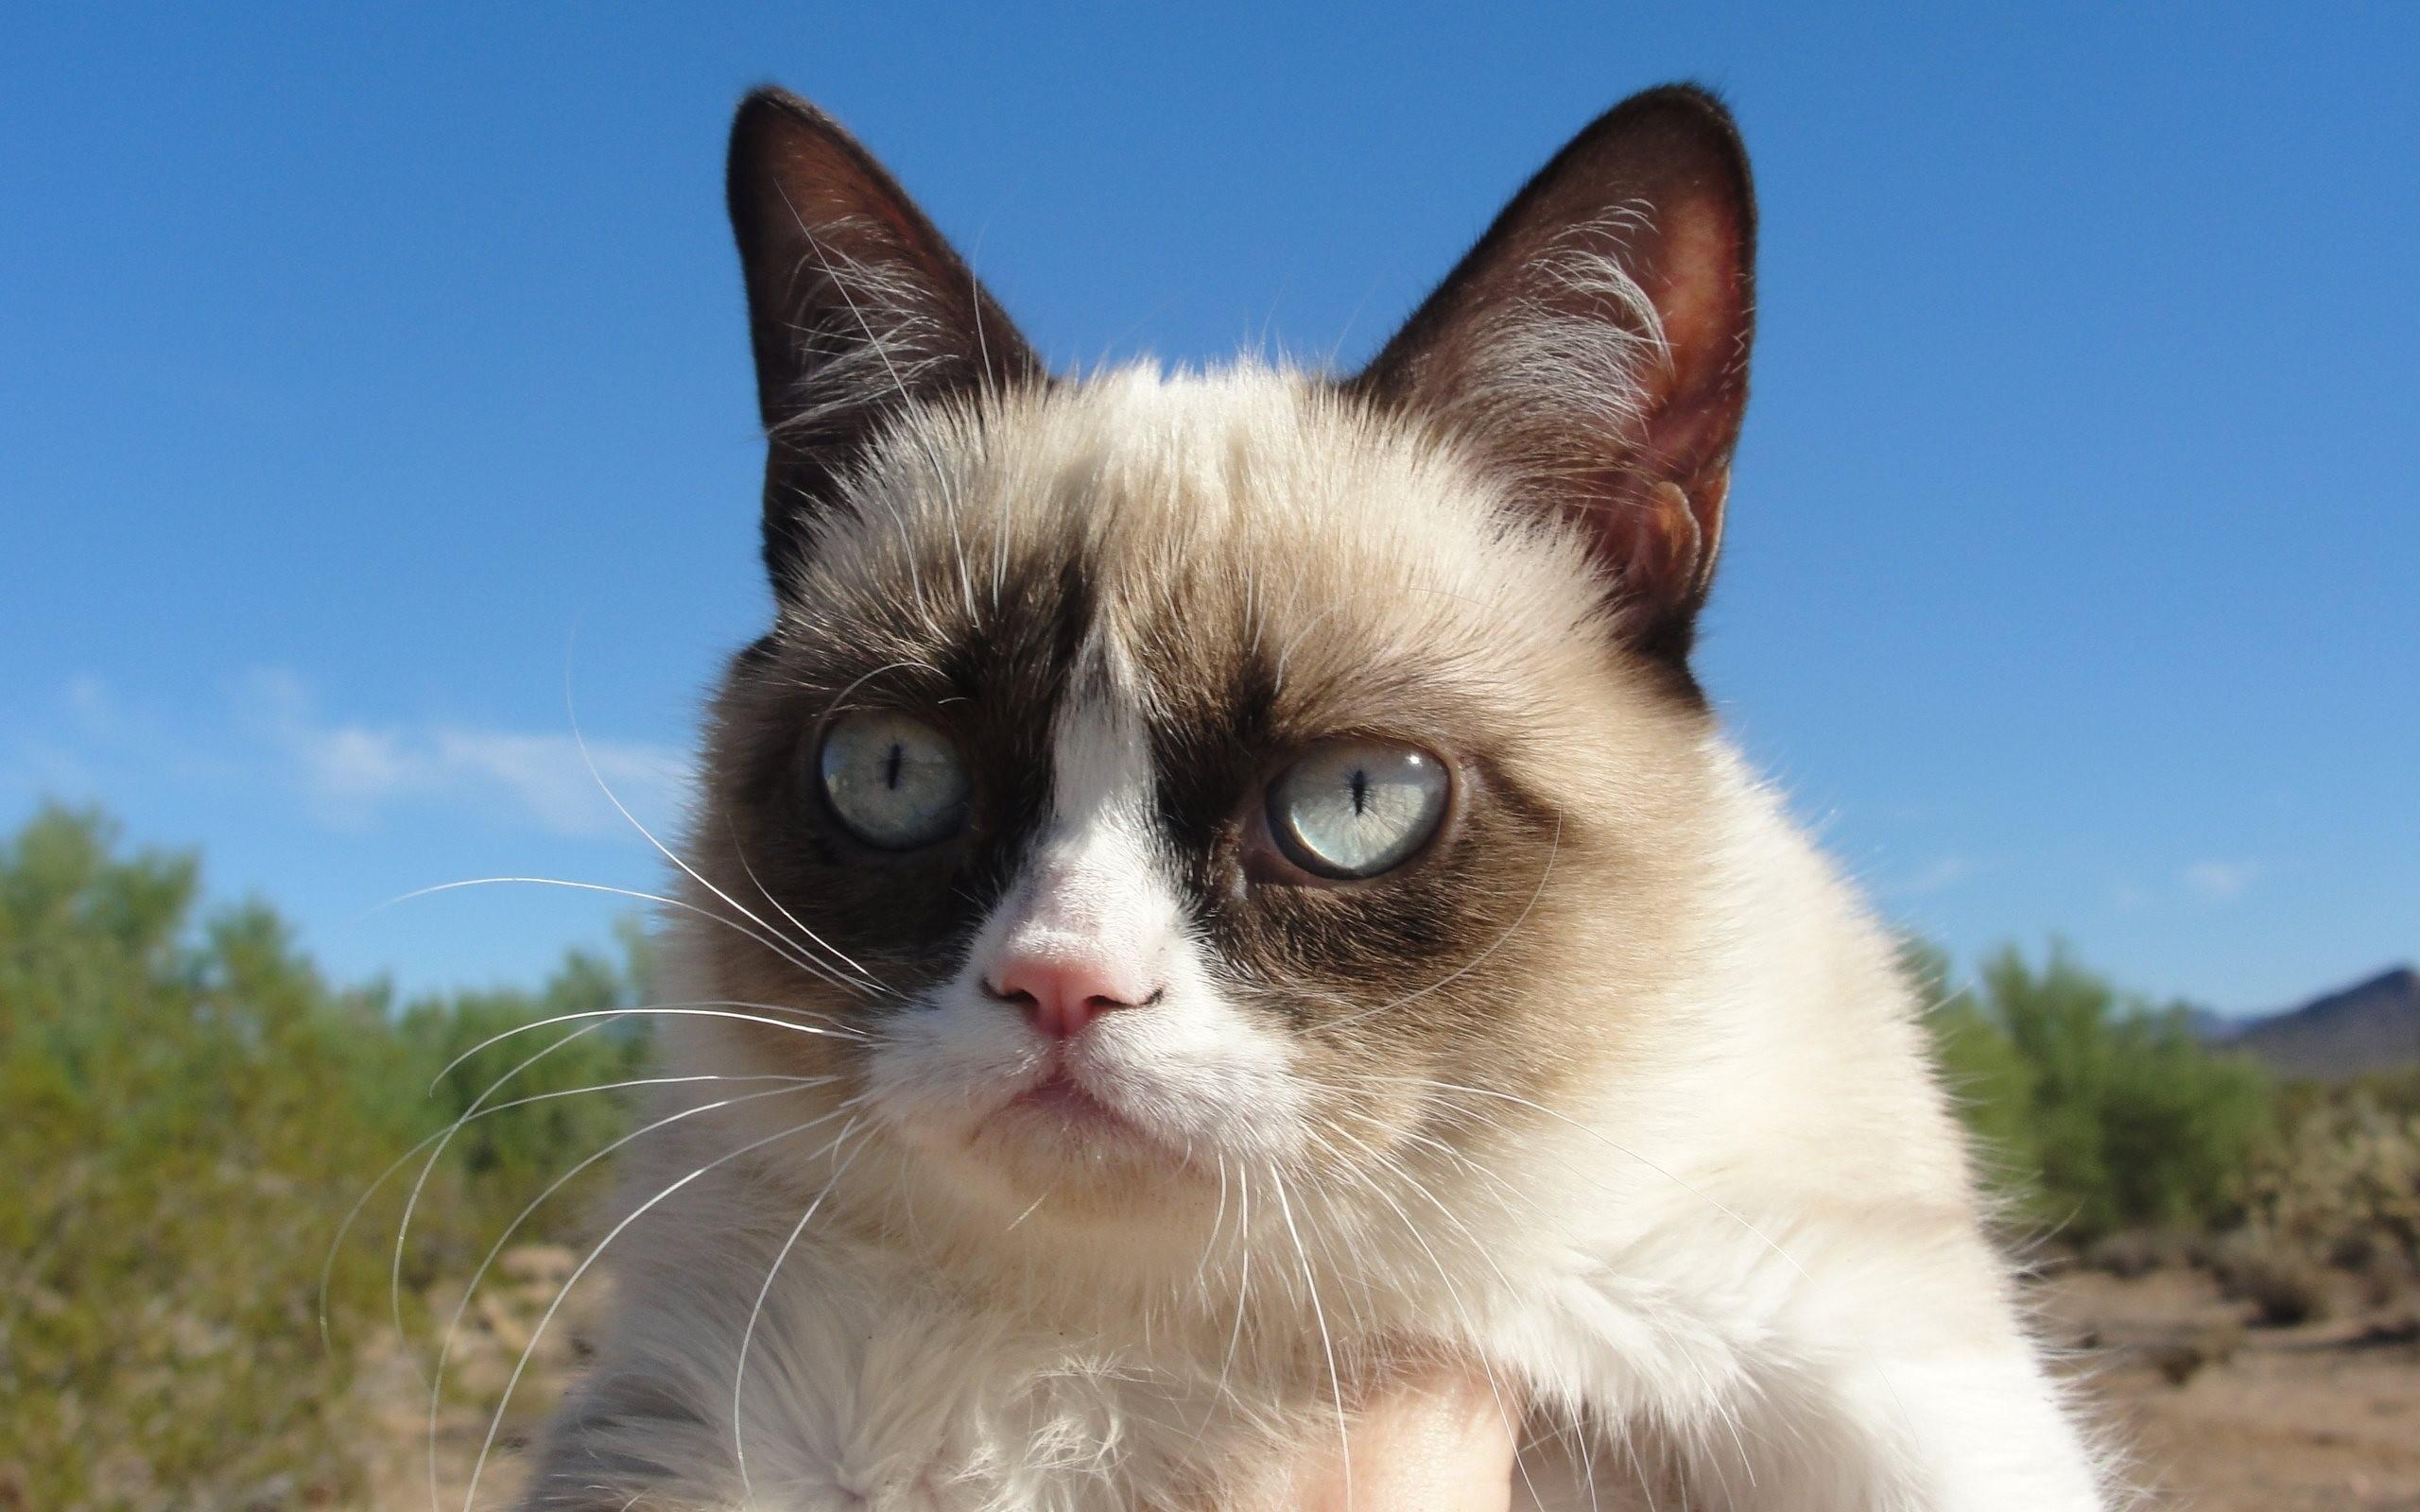 General 2560x1600 animals cats Grumpy Cat mammals animal eyes outdoors